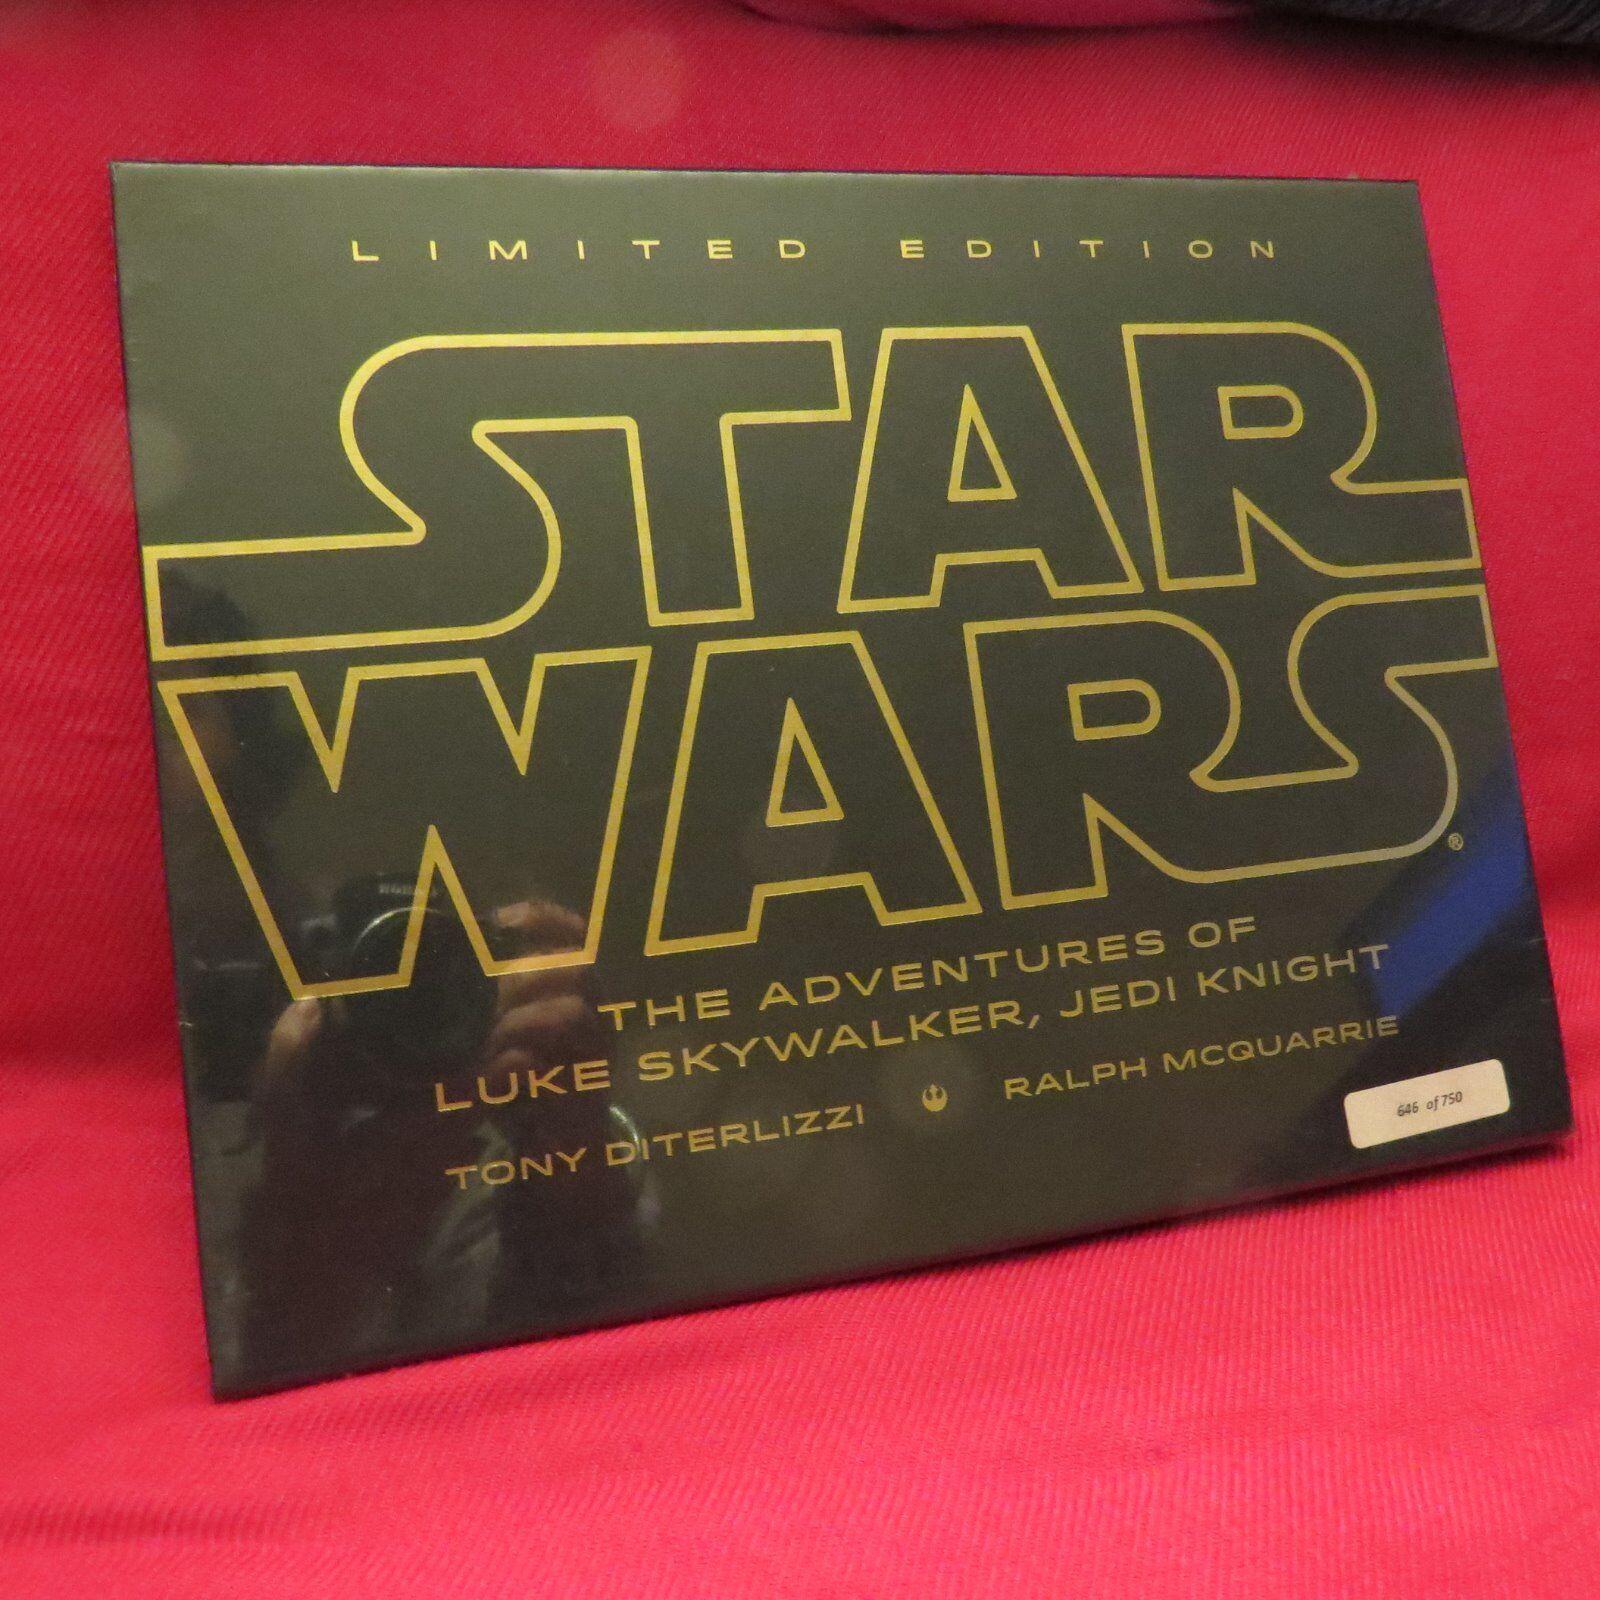 Firmado las aventuras de Luke Skywalker, Jedi Knight (edición Limitada) + Bonus